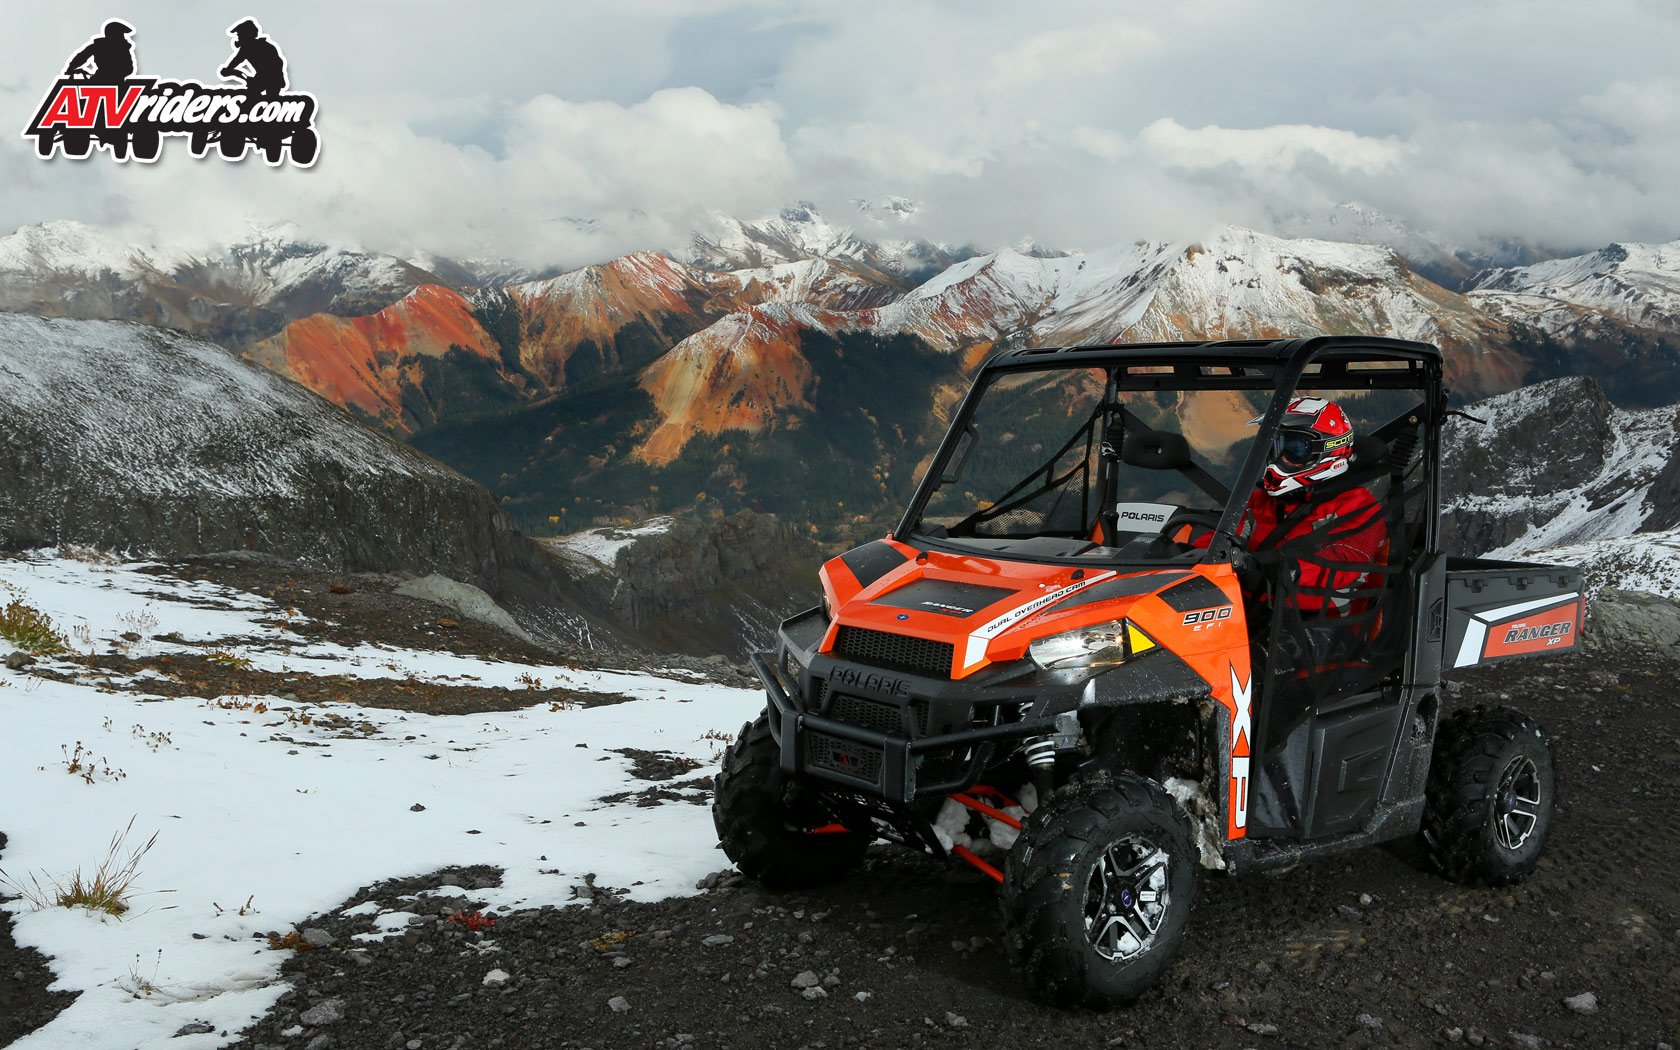 2013 Polaris RANGER XP 900 SxS UTV   Red Mountains Colorado 1680x1050